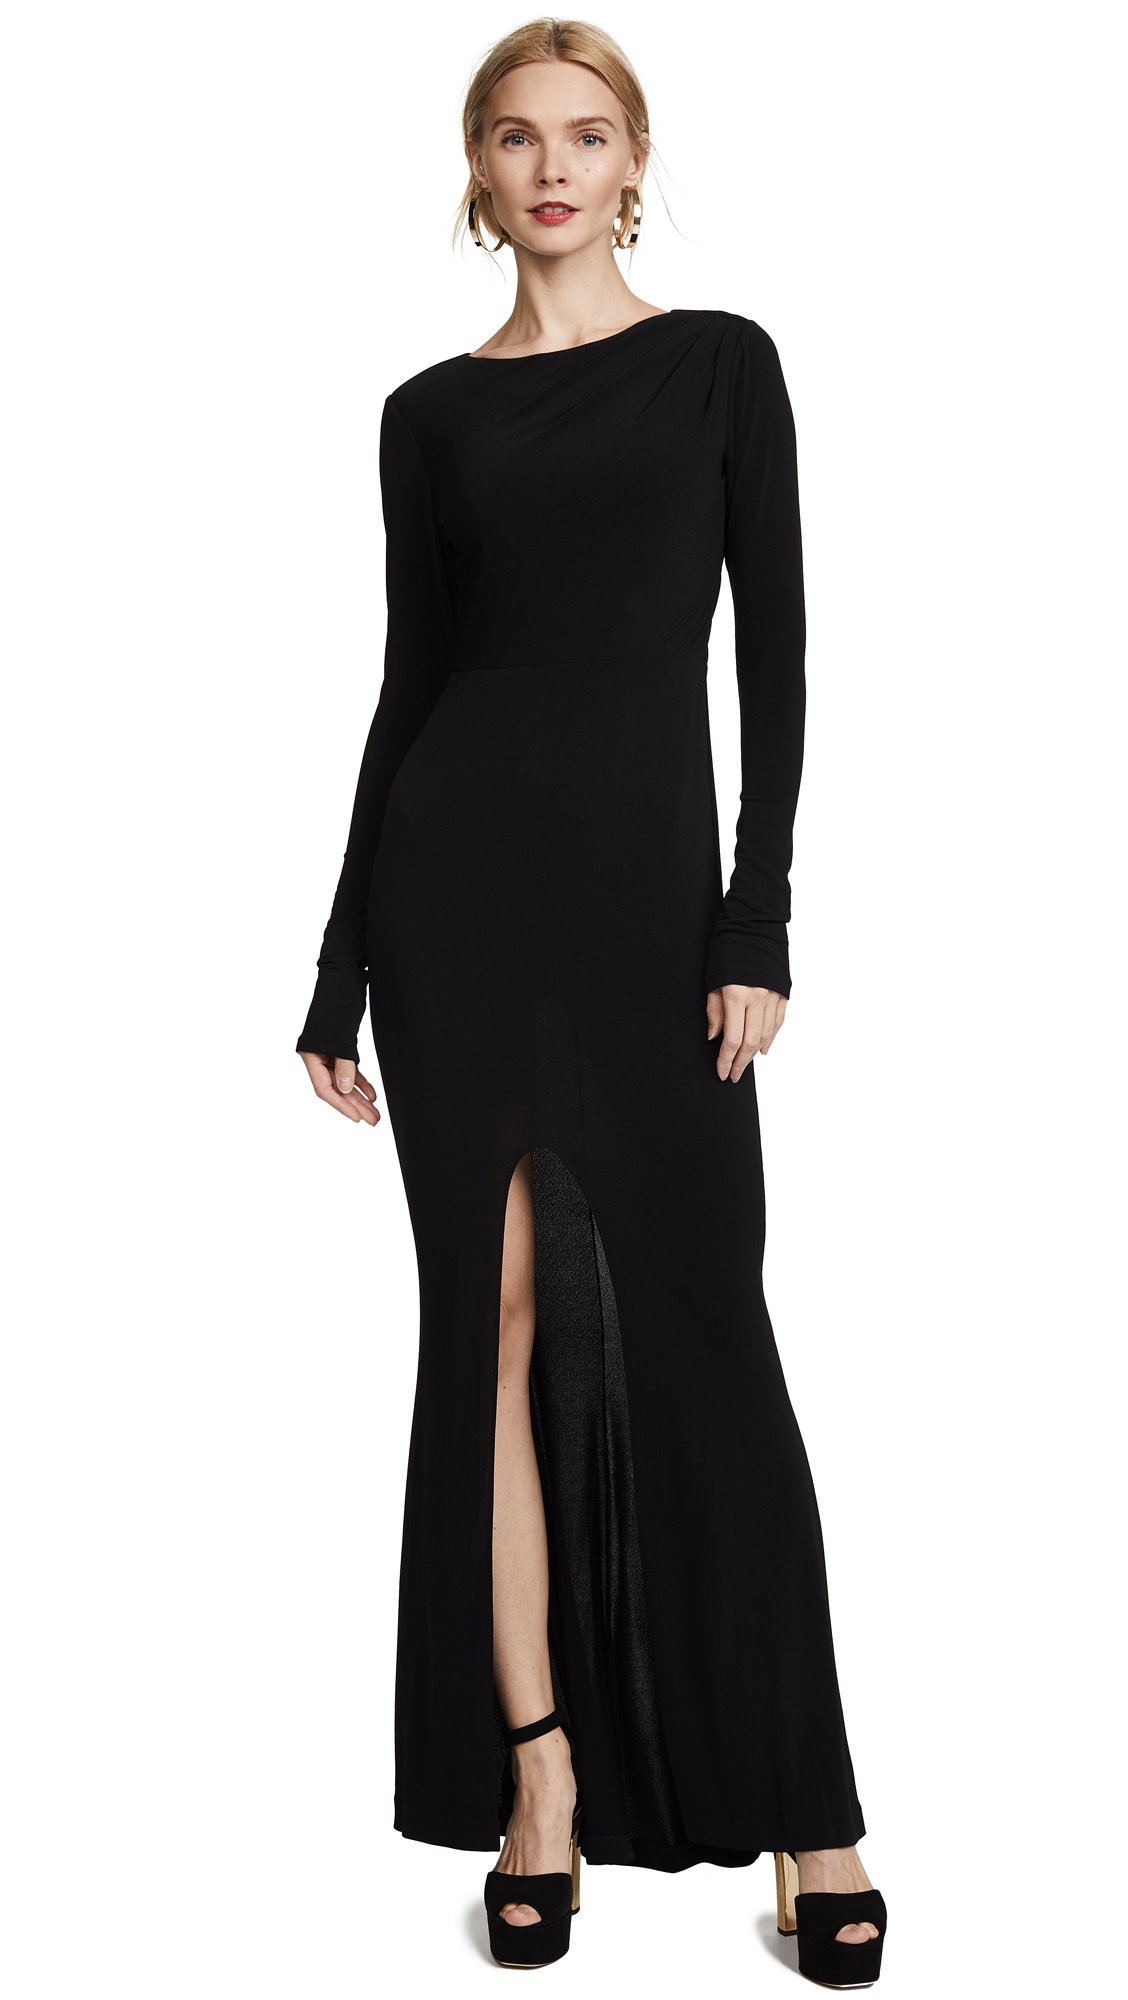 Rachel Zoe Long Sleeve Gown - Black